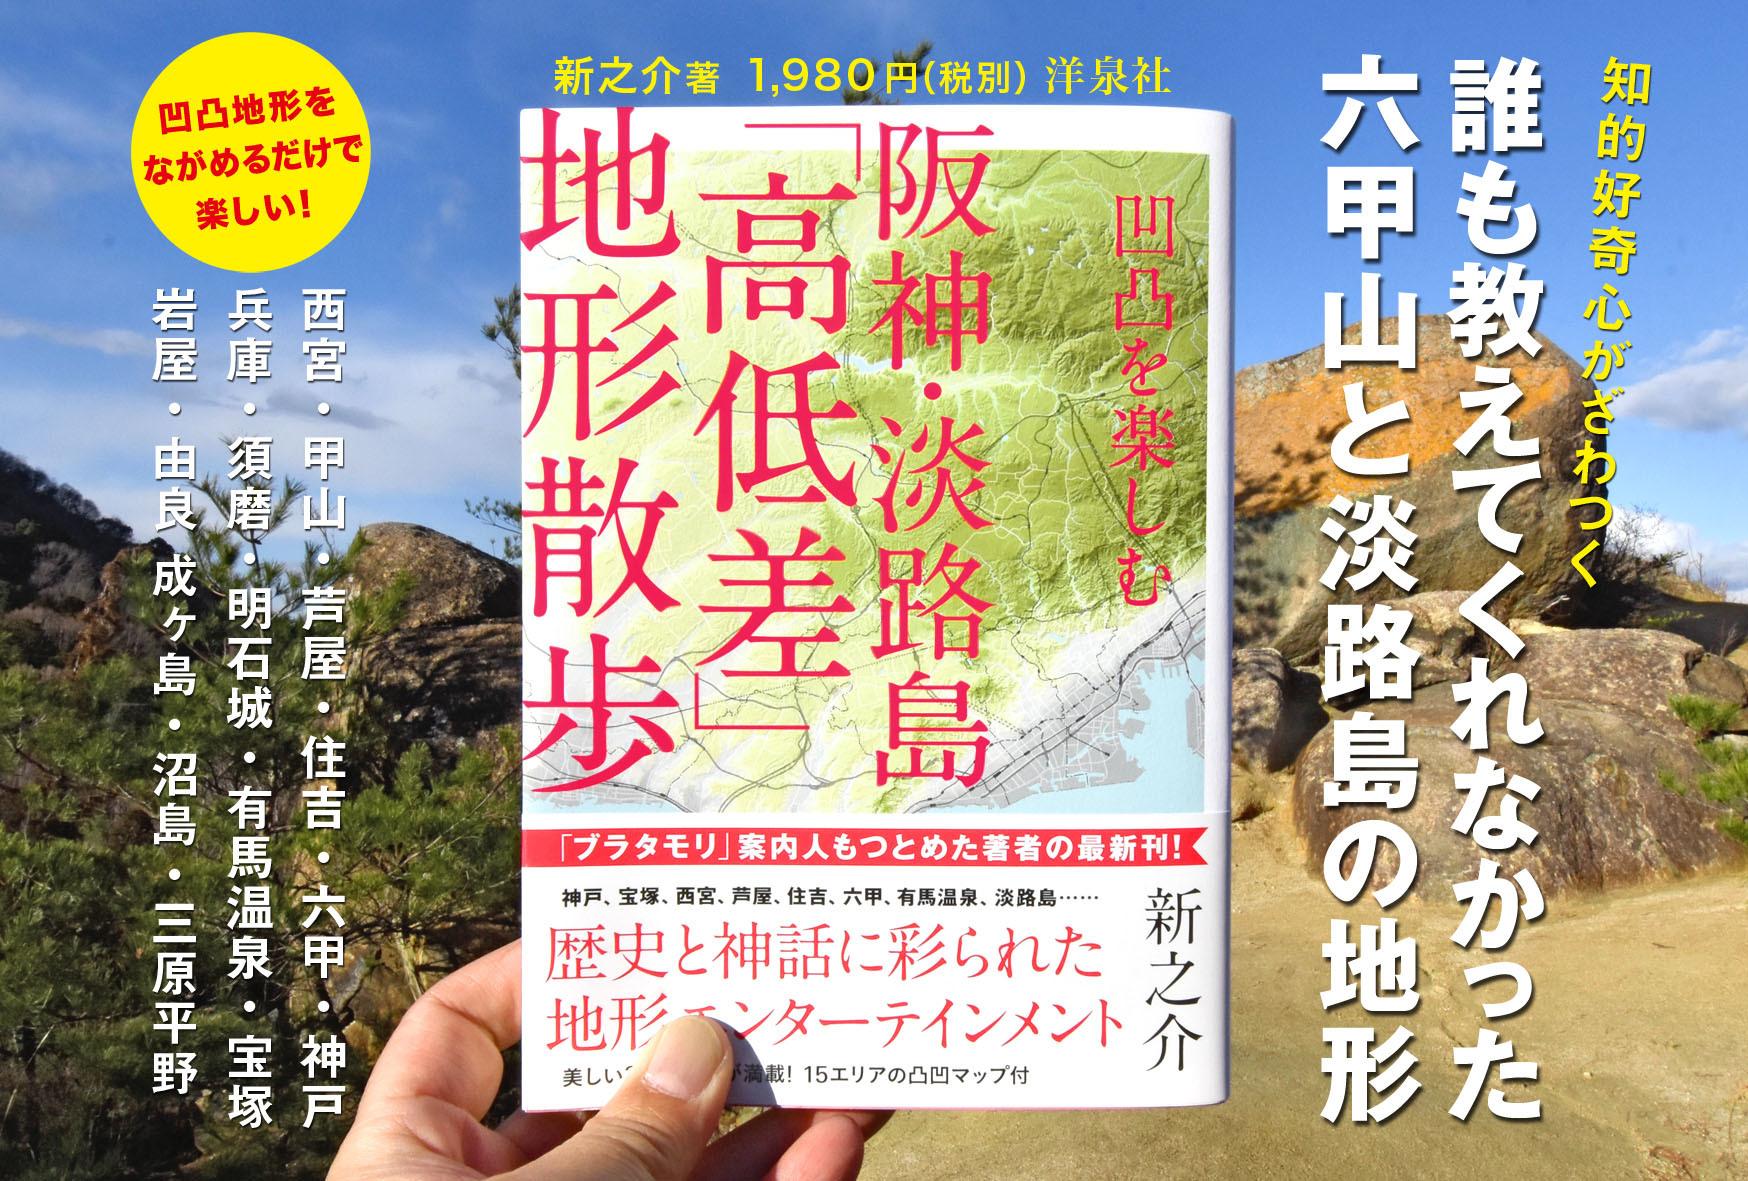 han_hagaki_yoko.jpg